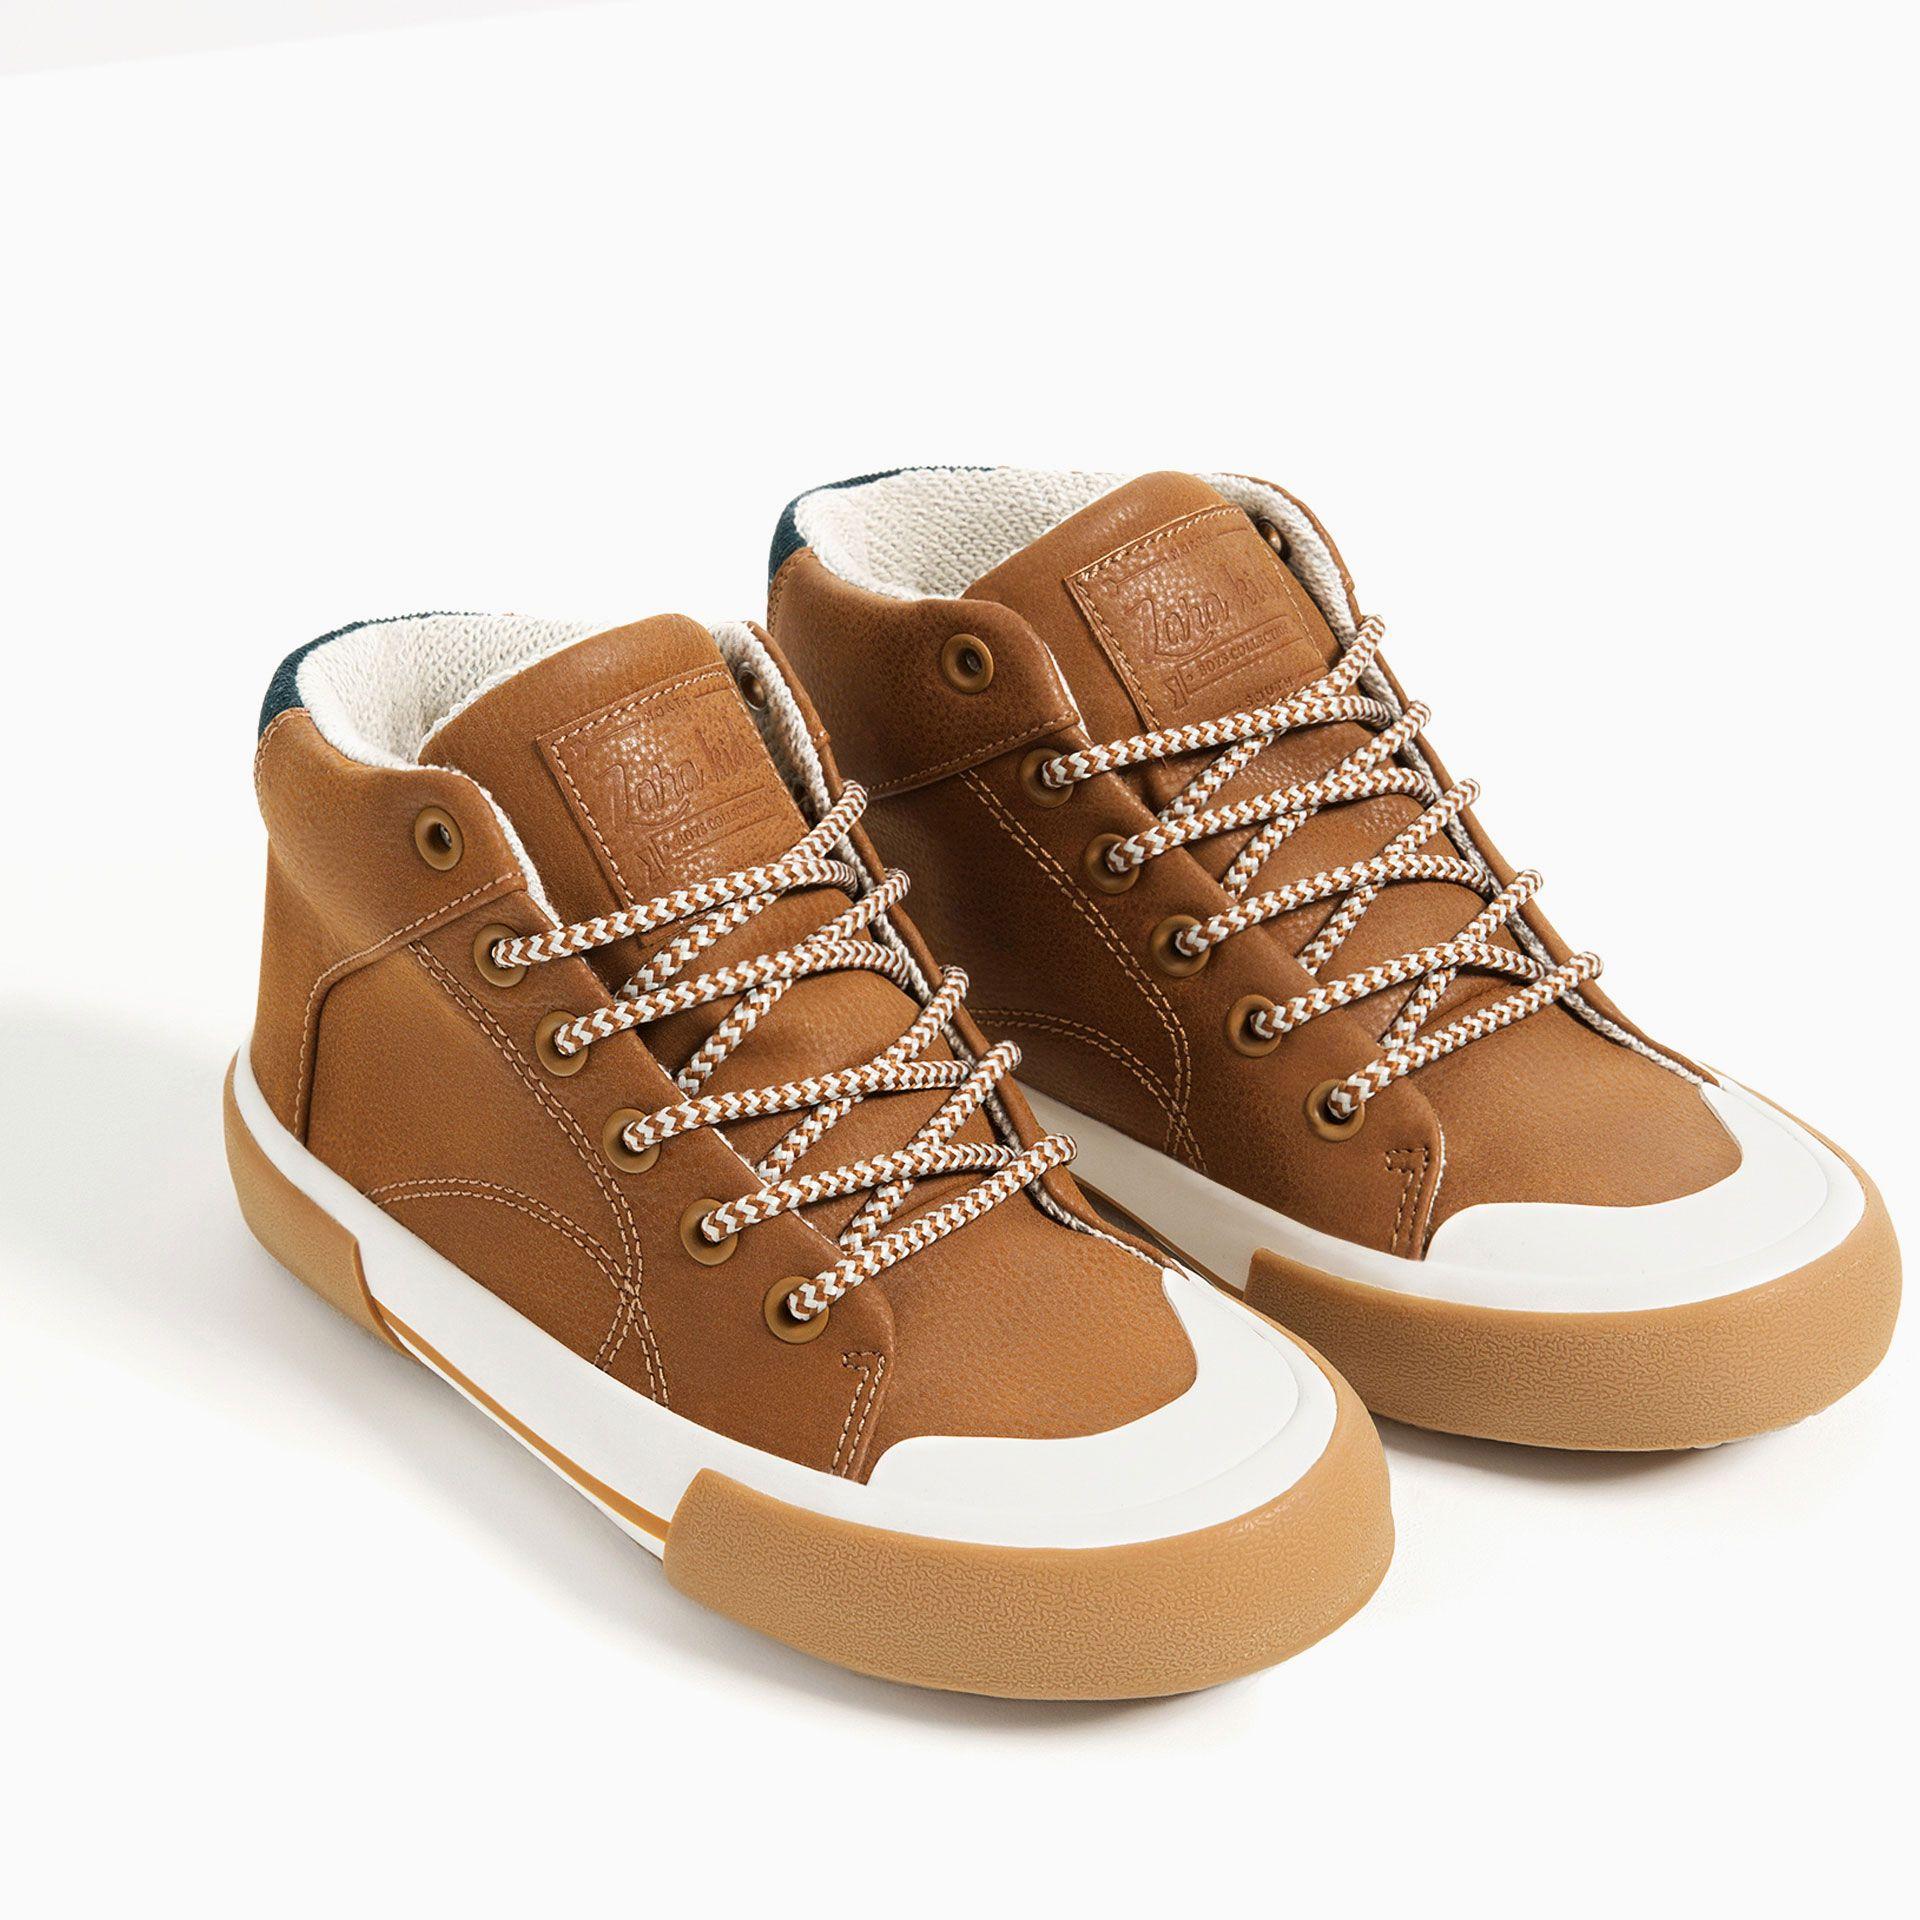 Sportowe Botki Za Kostke Zara Boots Shoes